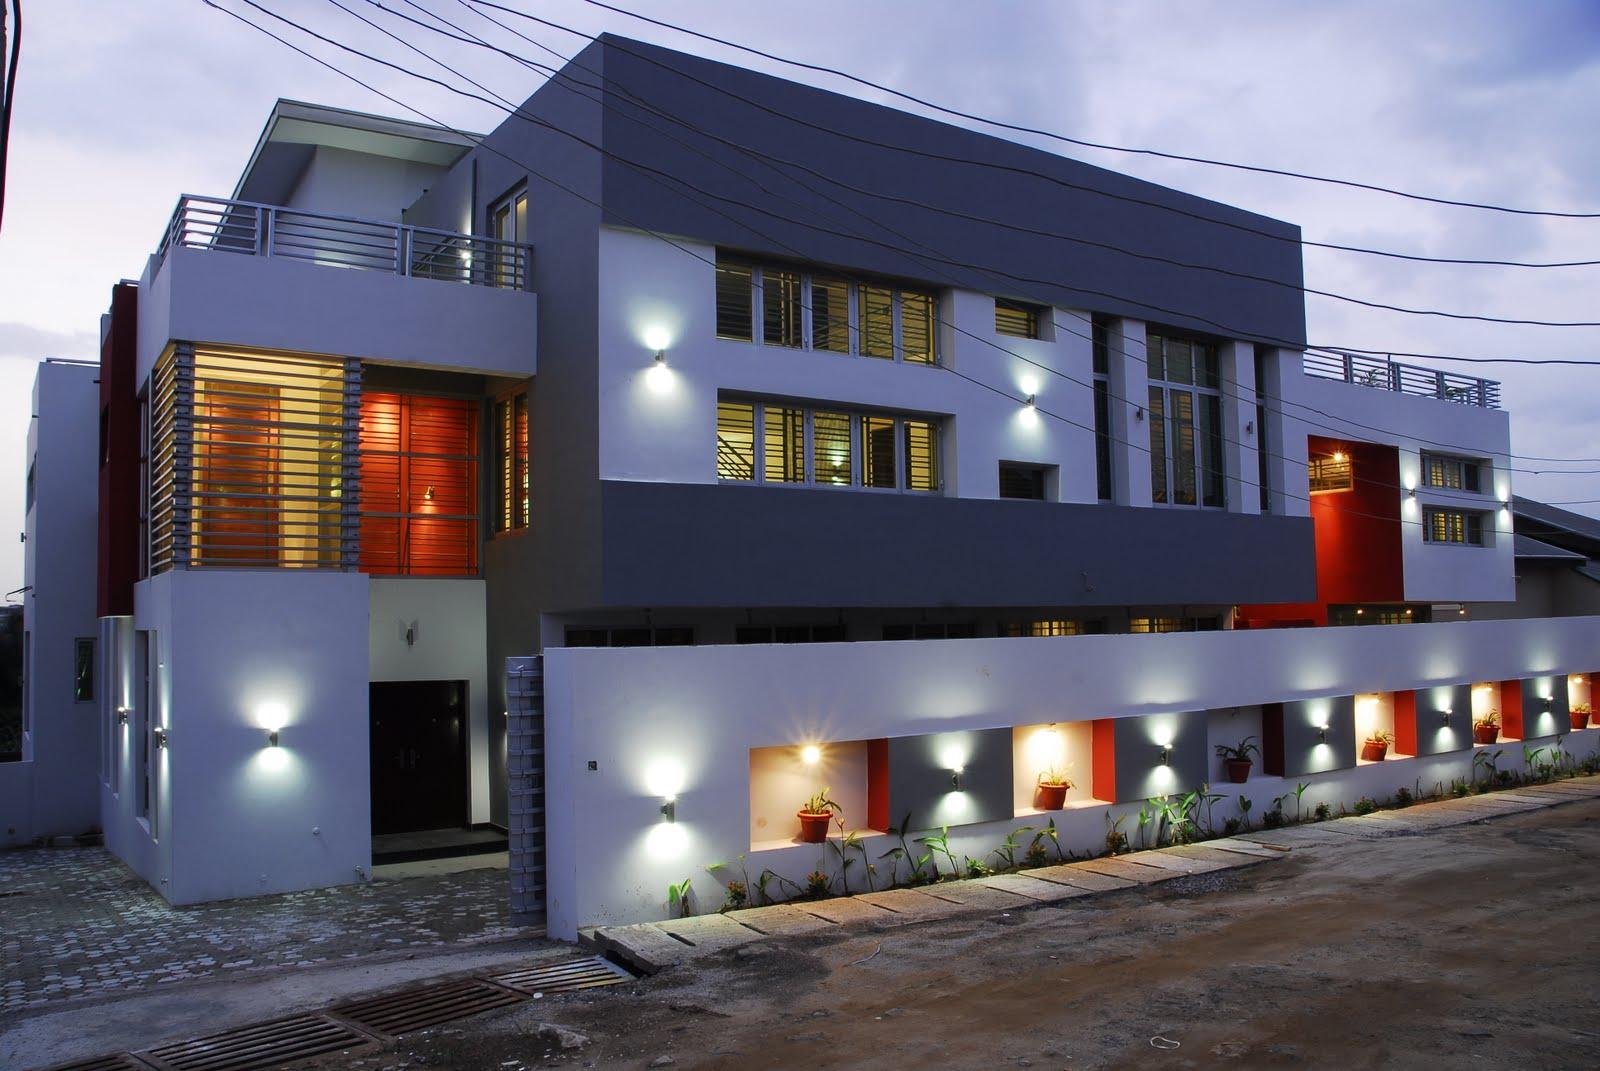 HAVEN HOMES BERTHS IN NIGERIA